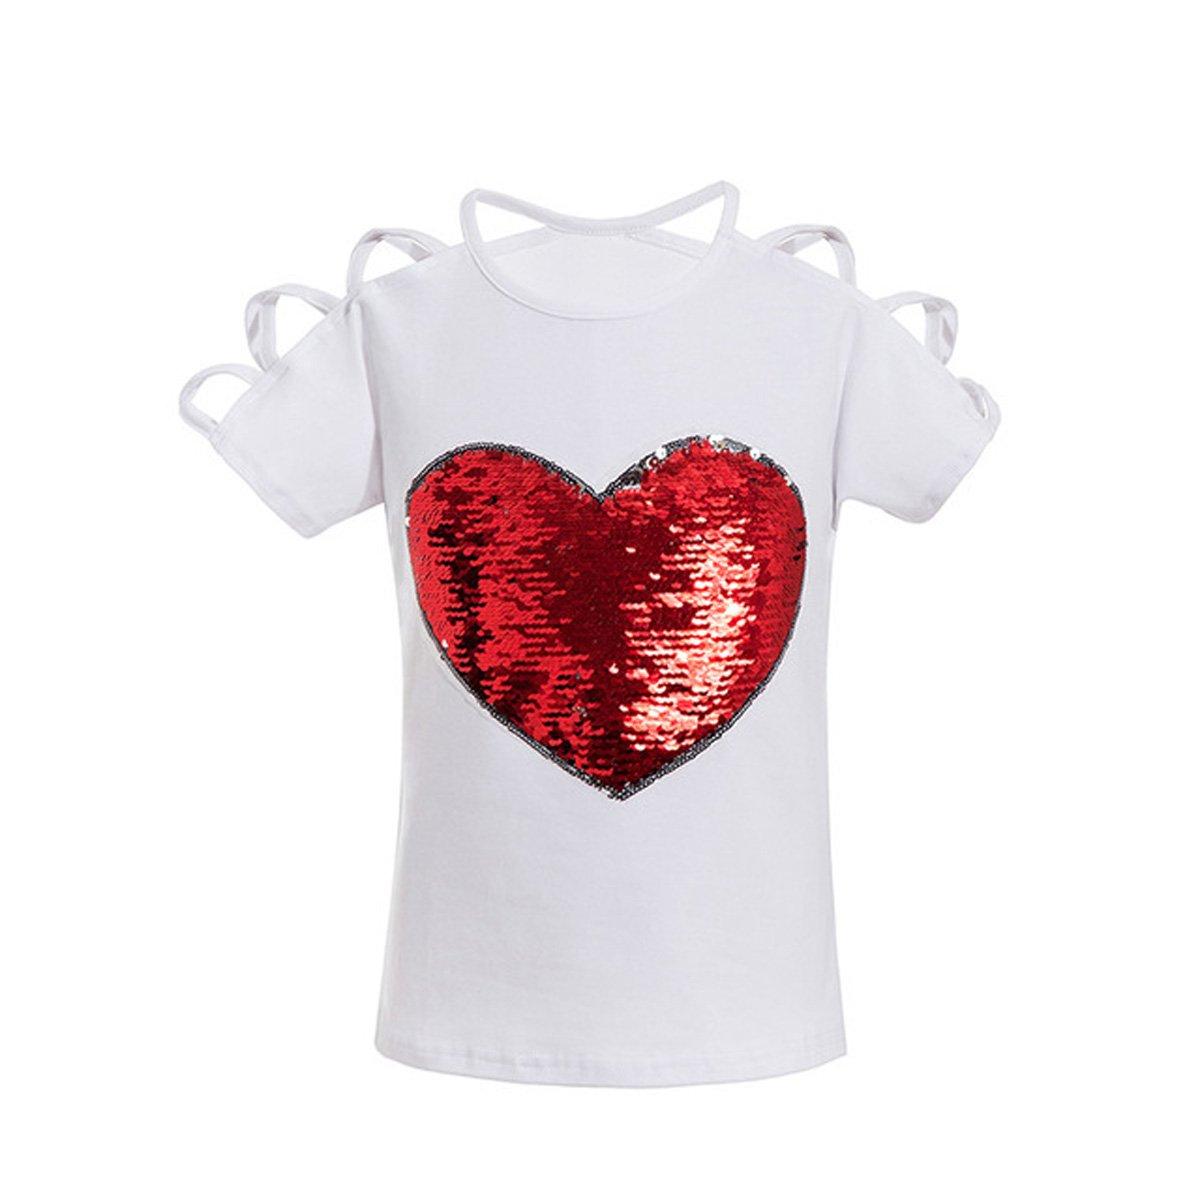 VIPbuy Kid Girls' Short Sleeve T-Shirt Magic Reversible Sequins Letter Print Tee Tops (51.2''-55.1'', White)